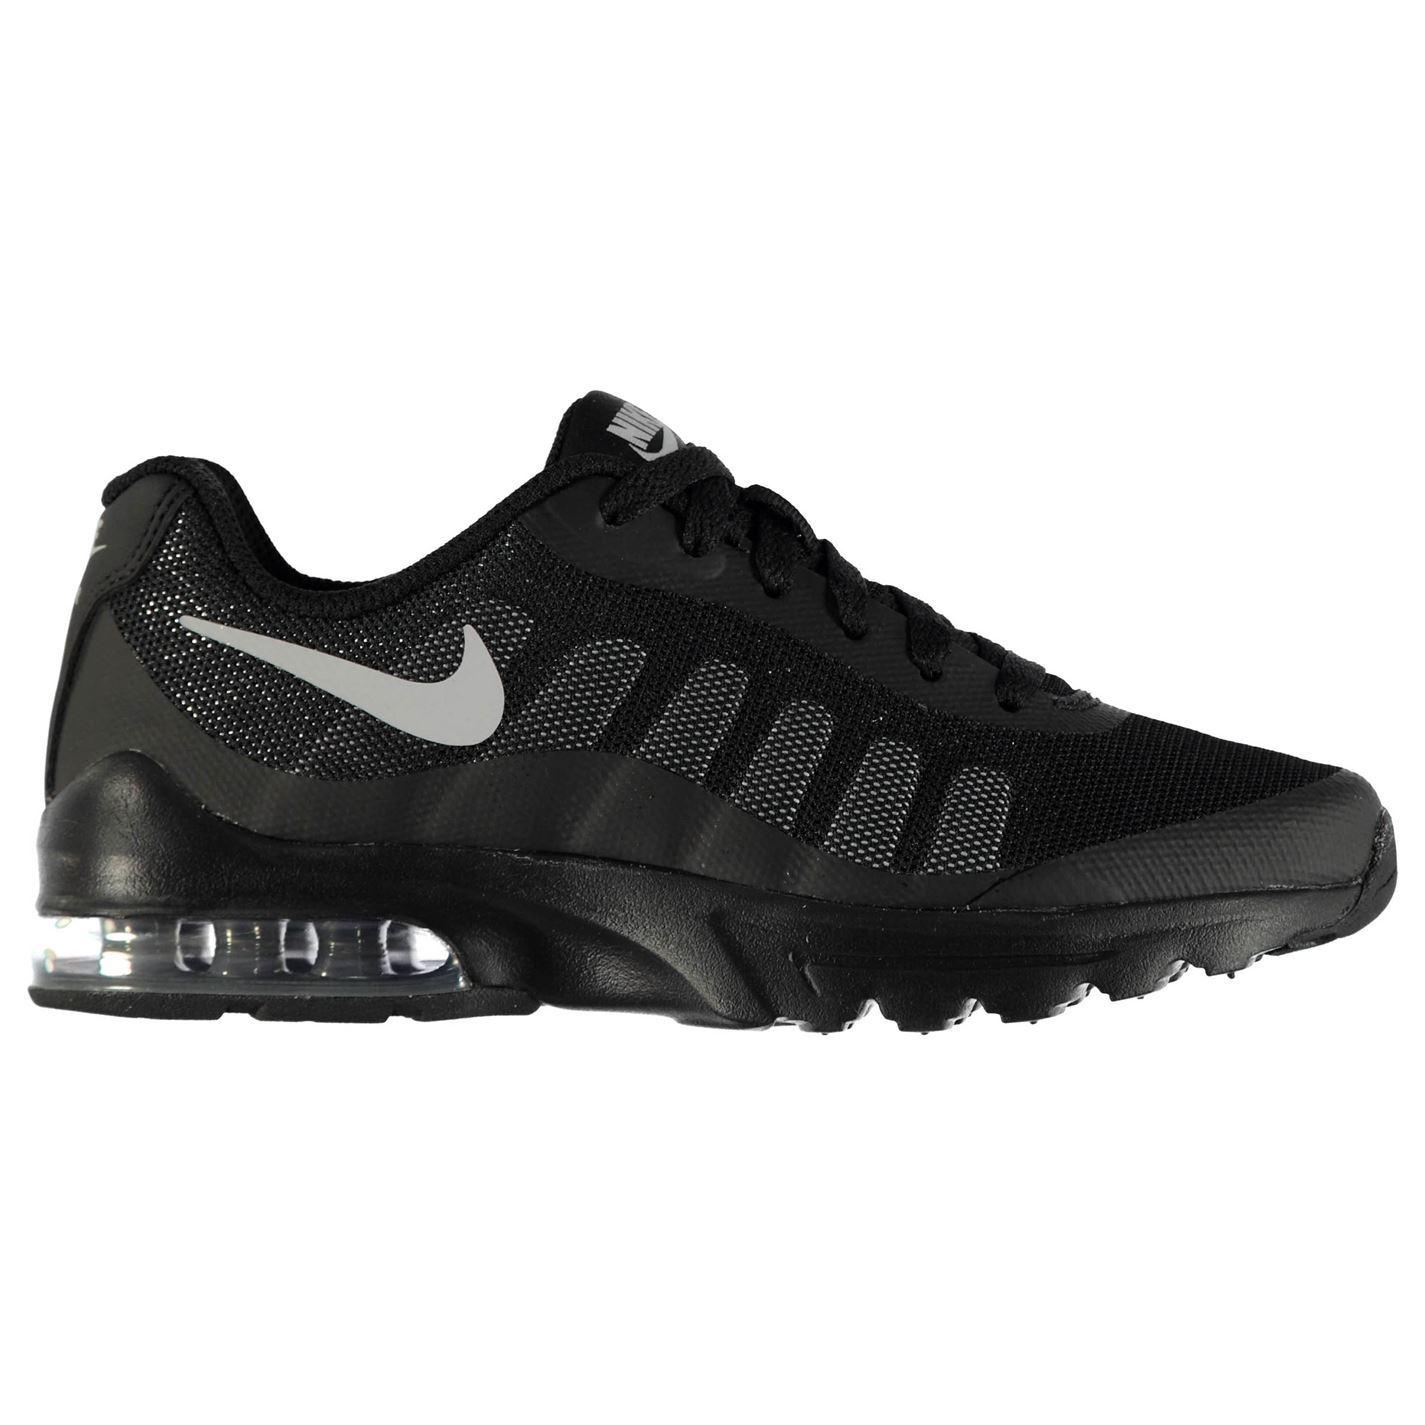 ec8004bf2ebd Nike Air Max Invigor Trainers Junior Boys Shoes Footwear